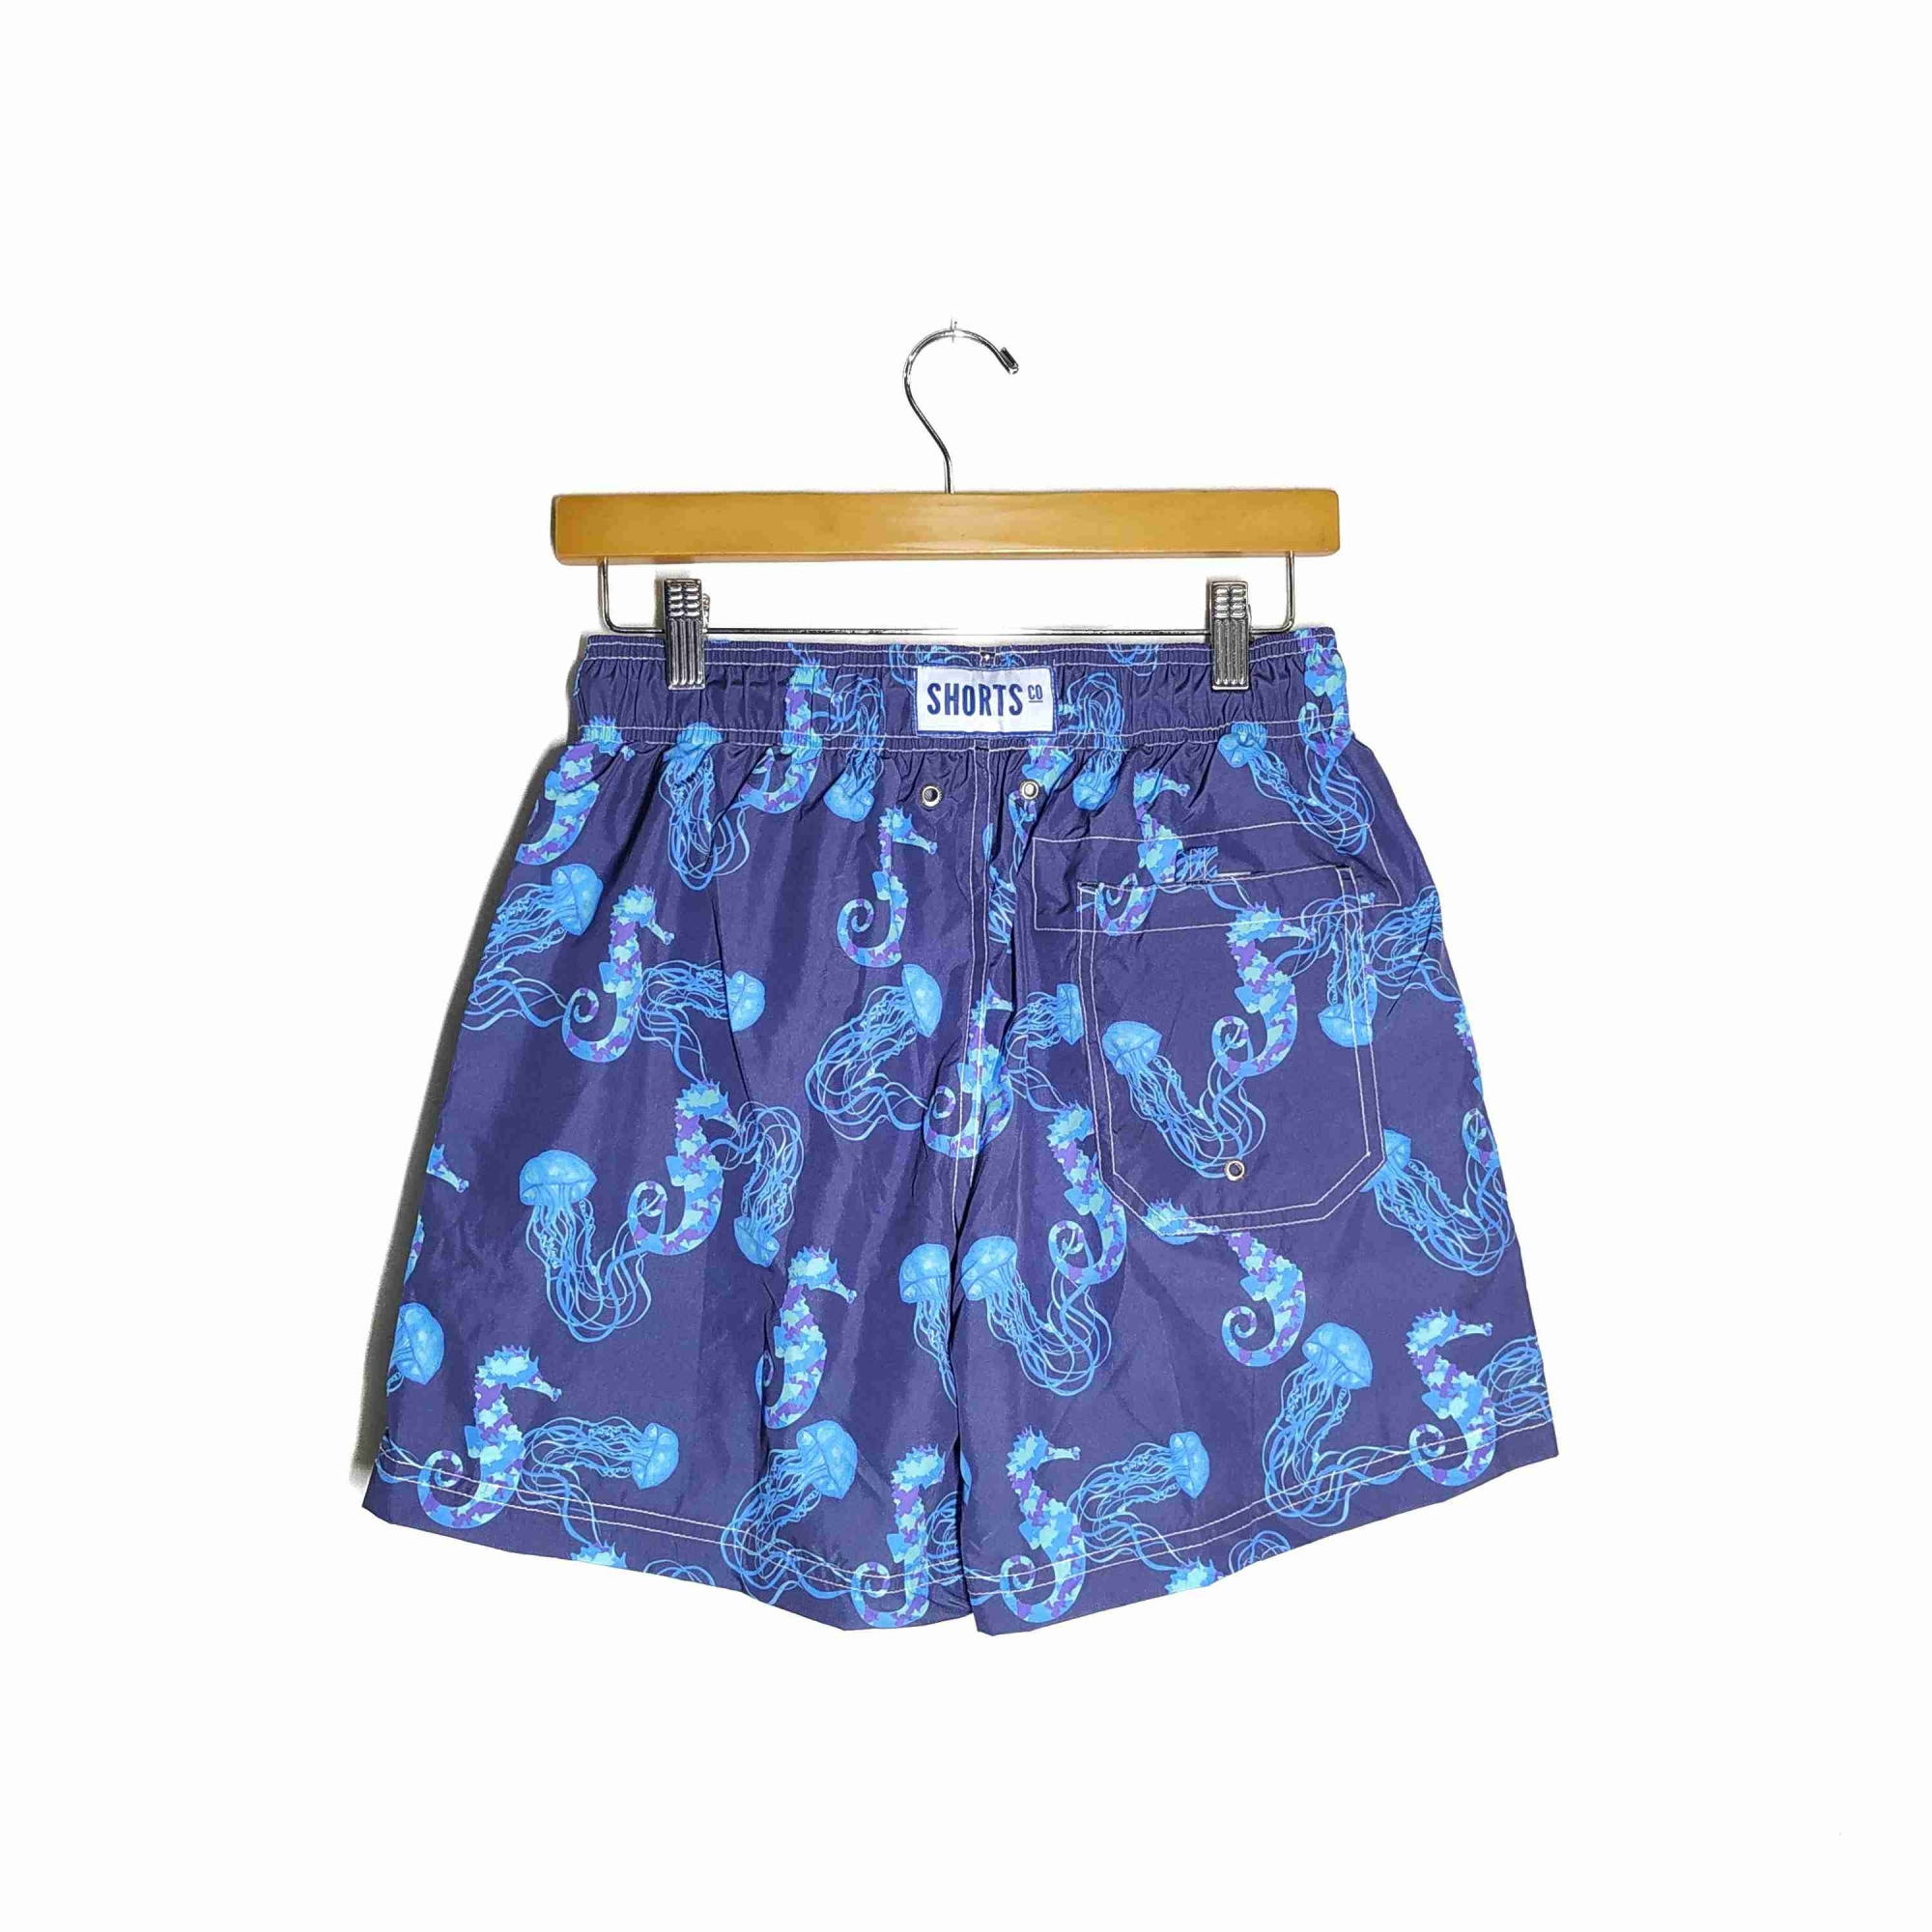 Shorts Co Shorts Especial Regular Mar Navy Adulto